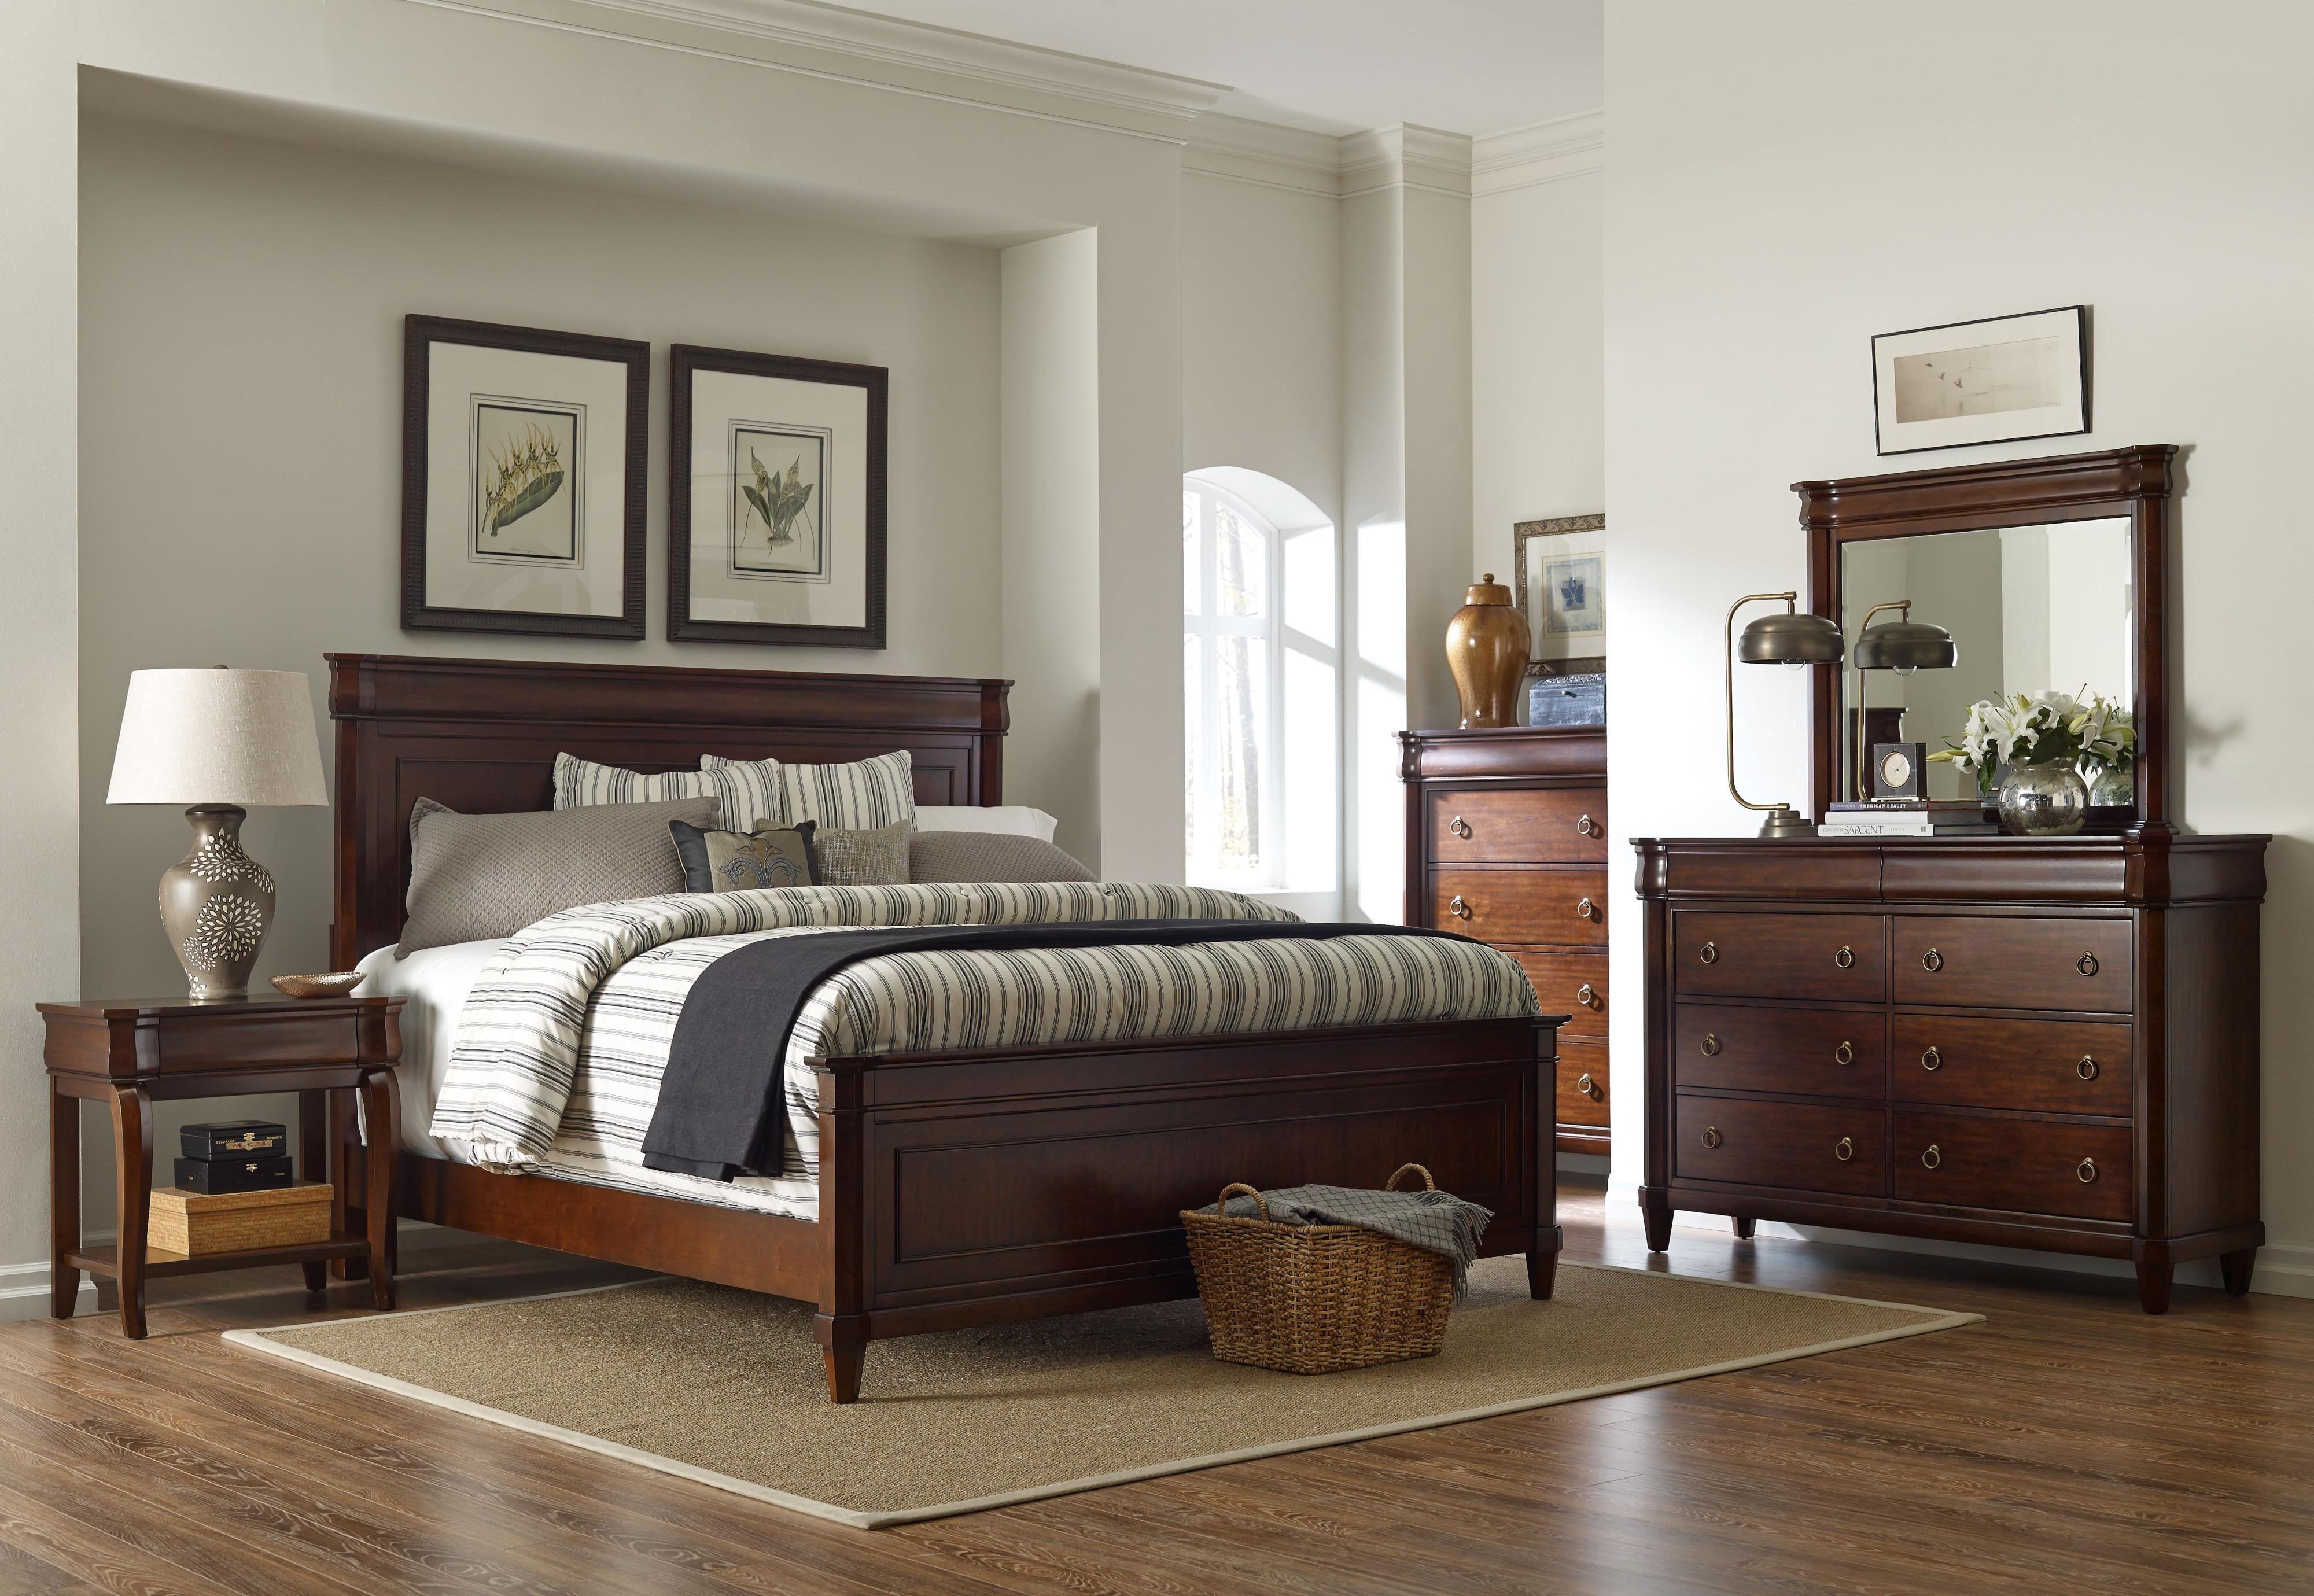 aryell king bedroom groupbroyhill furniture at darvin